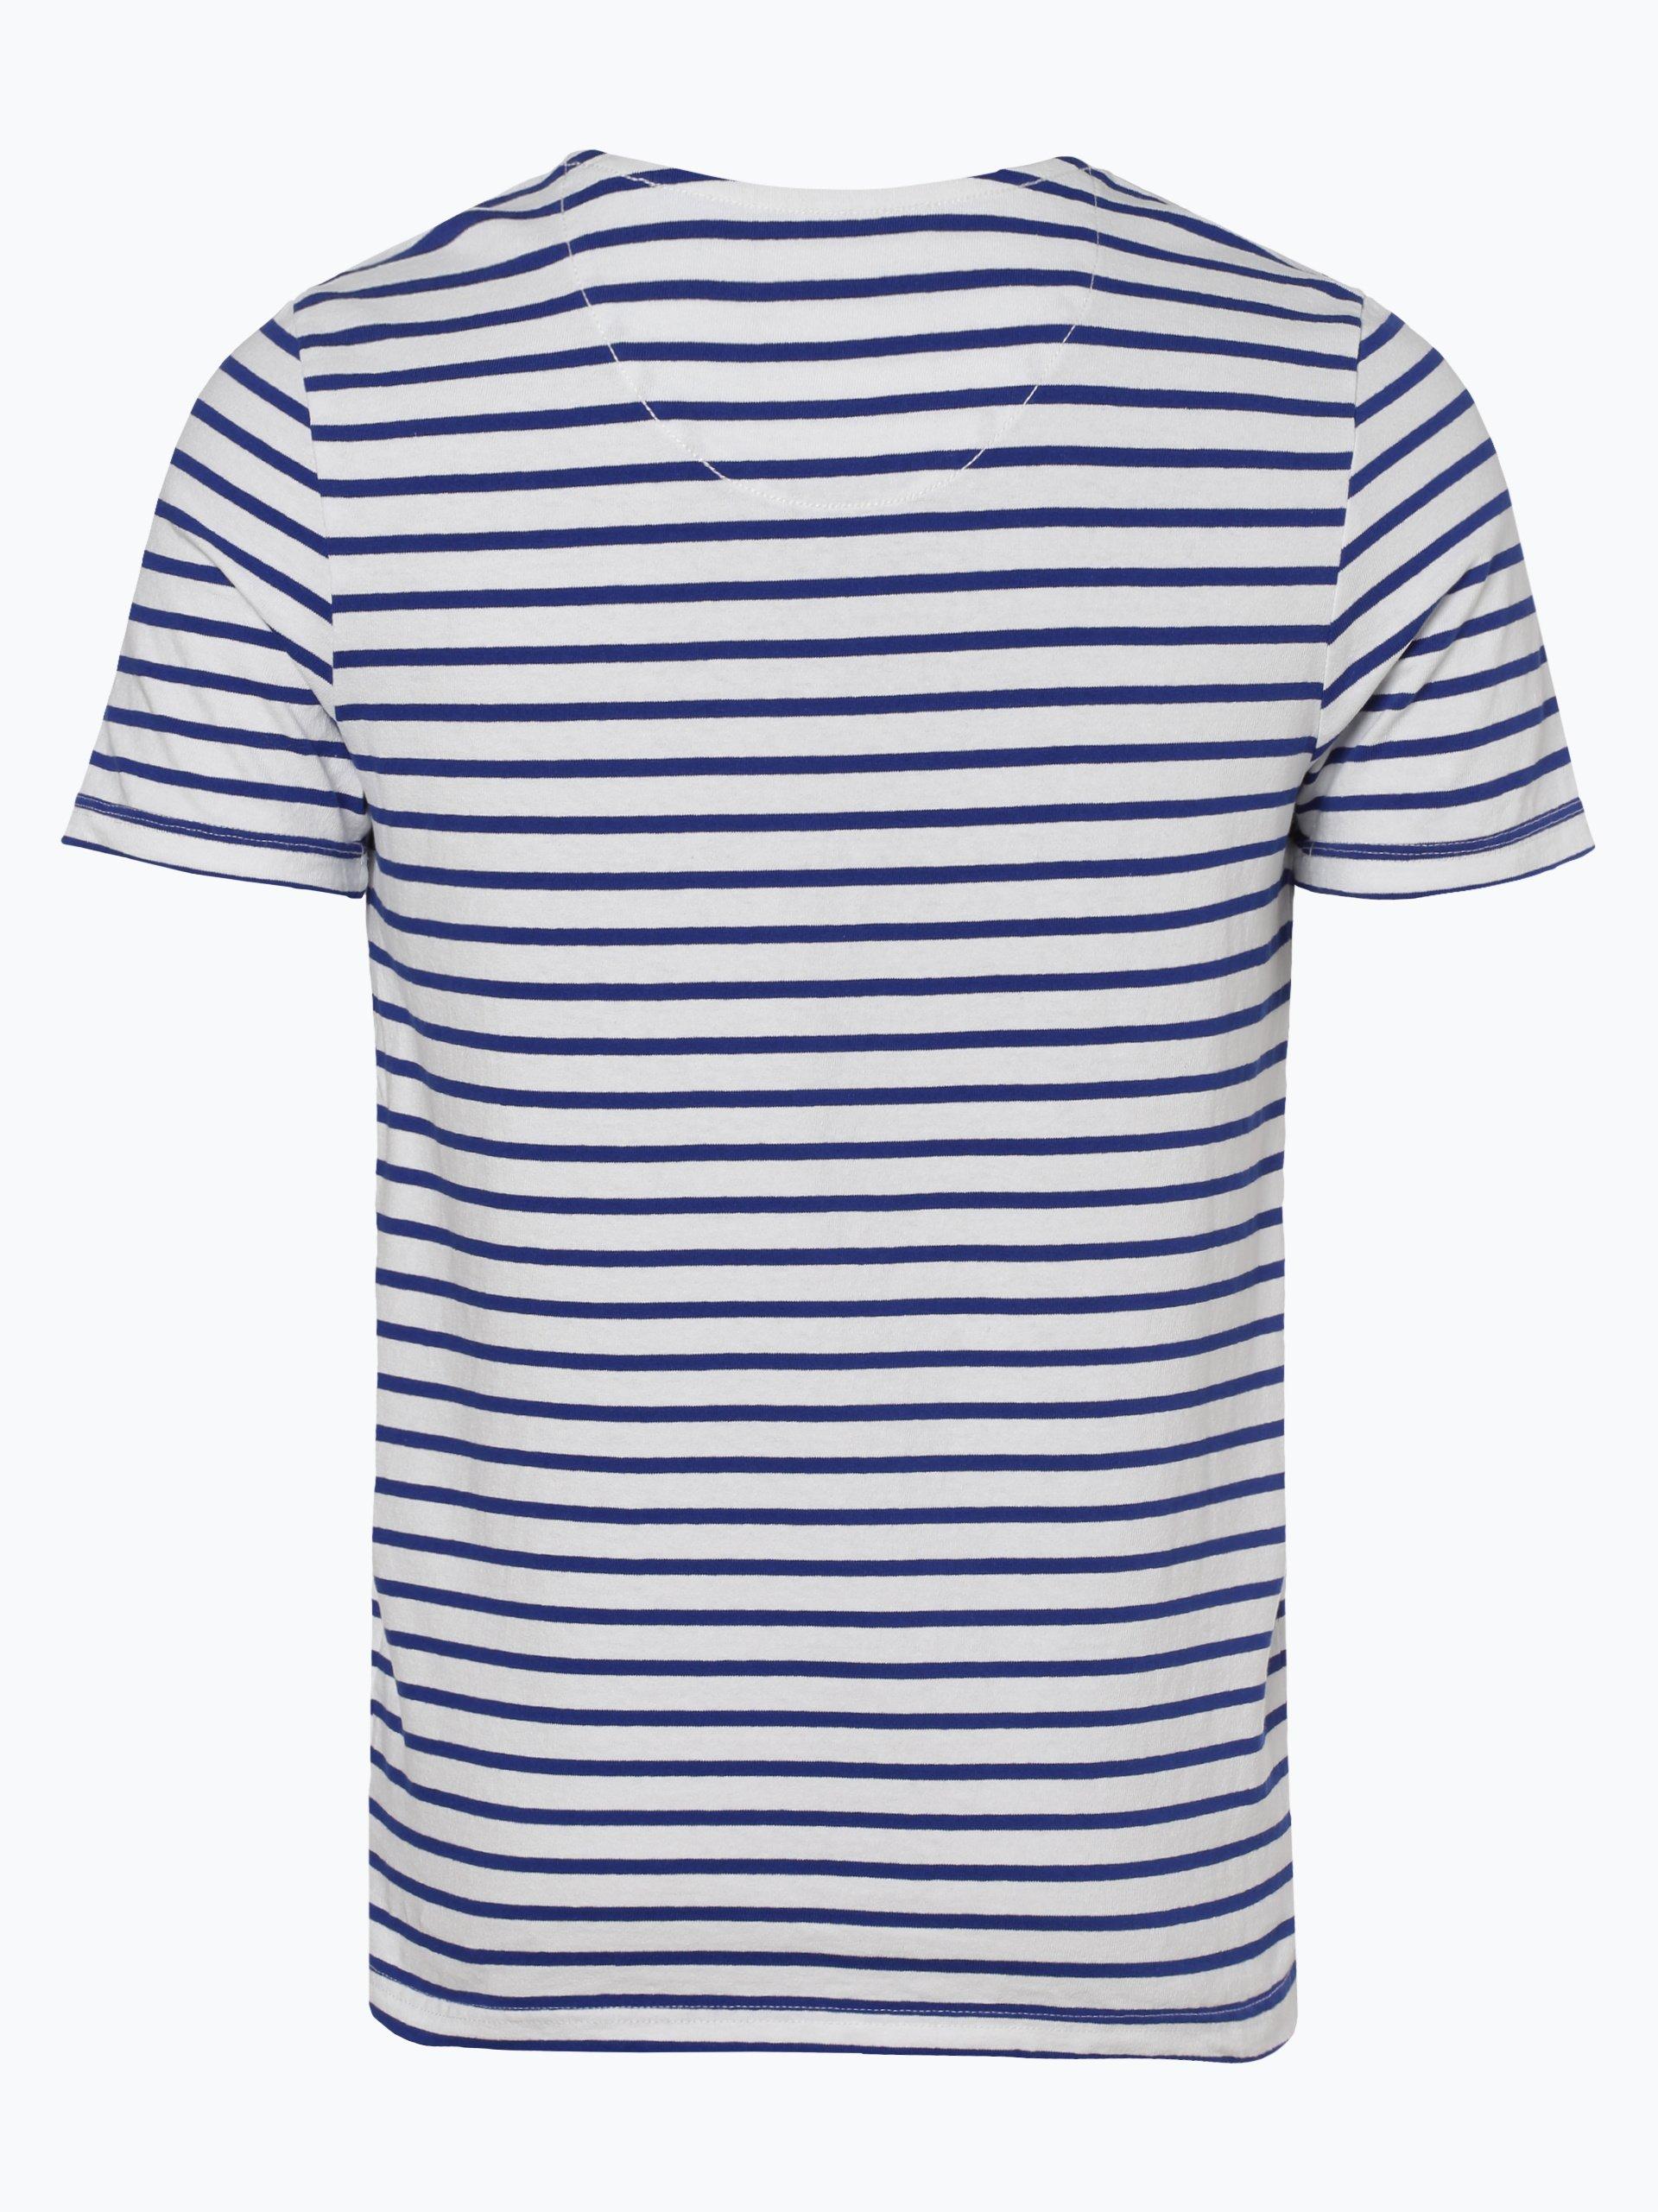 G-Star T-shirt męski – Xarrto